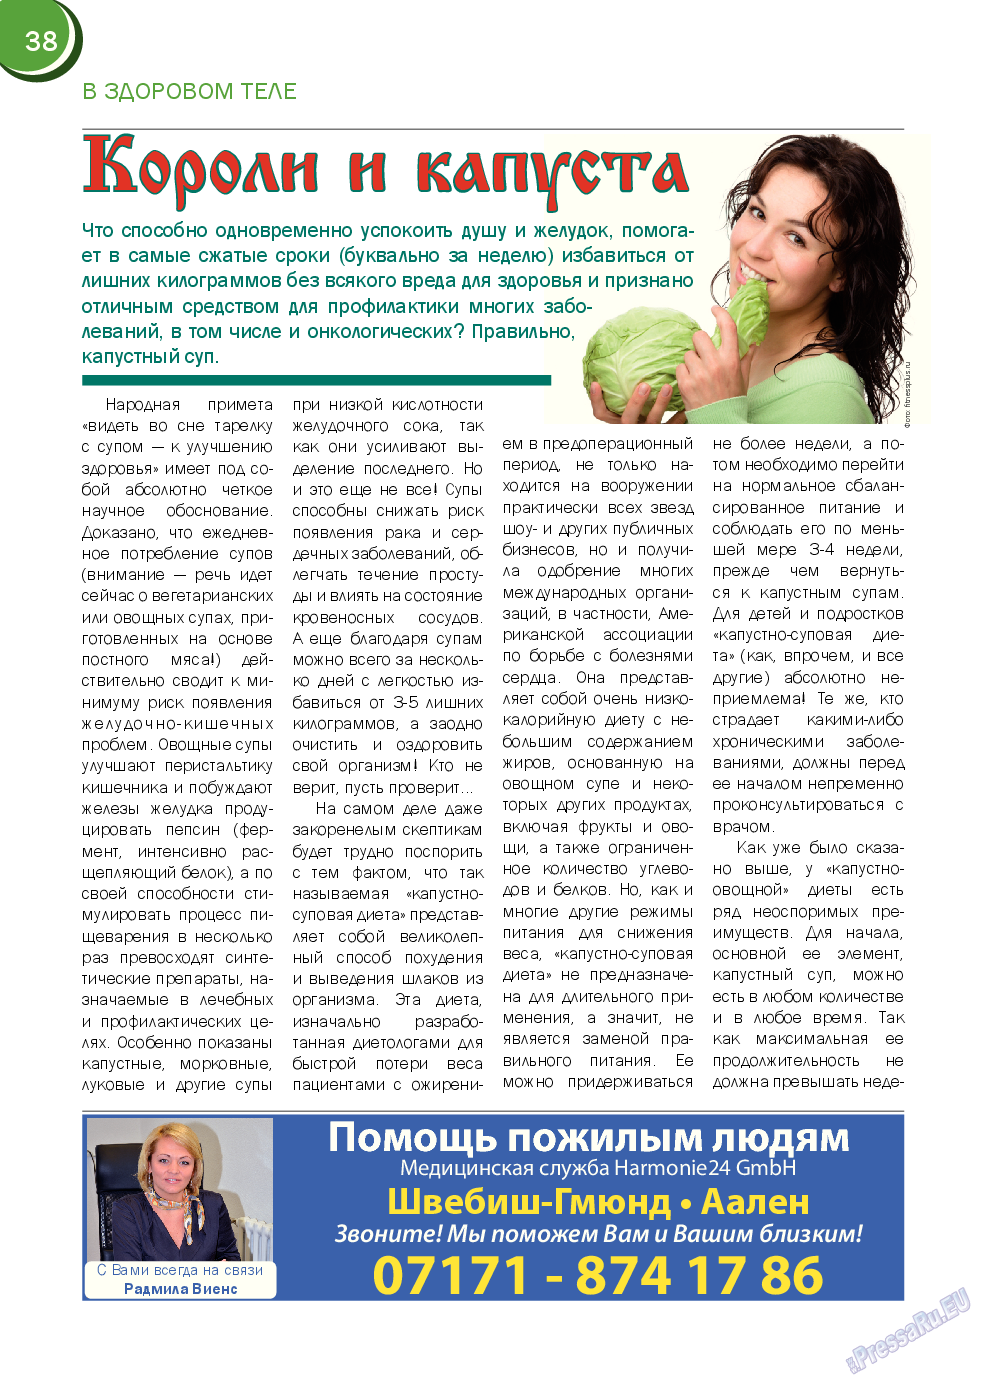 Русский Баден-Вюртемберг (журнал). 2014 год, номер 43, стр. 38